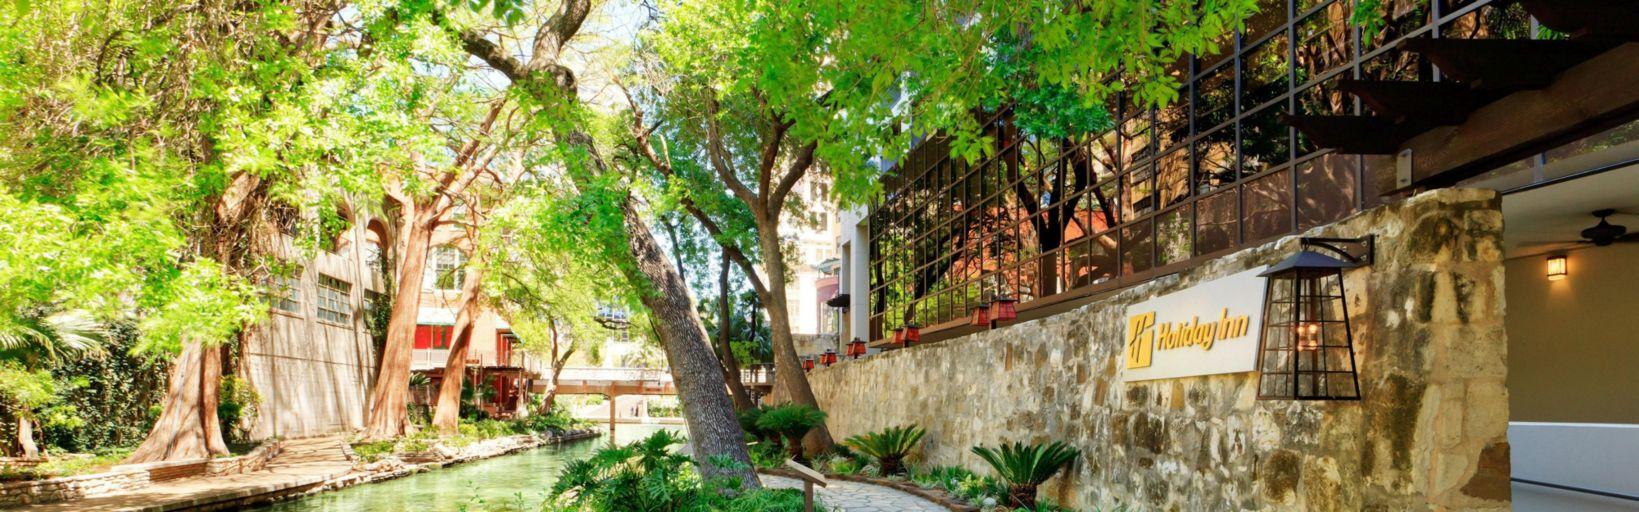 holiday inn san antonio riverwalk ihgのホテル